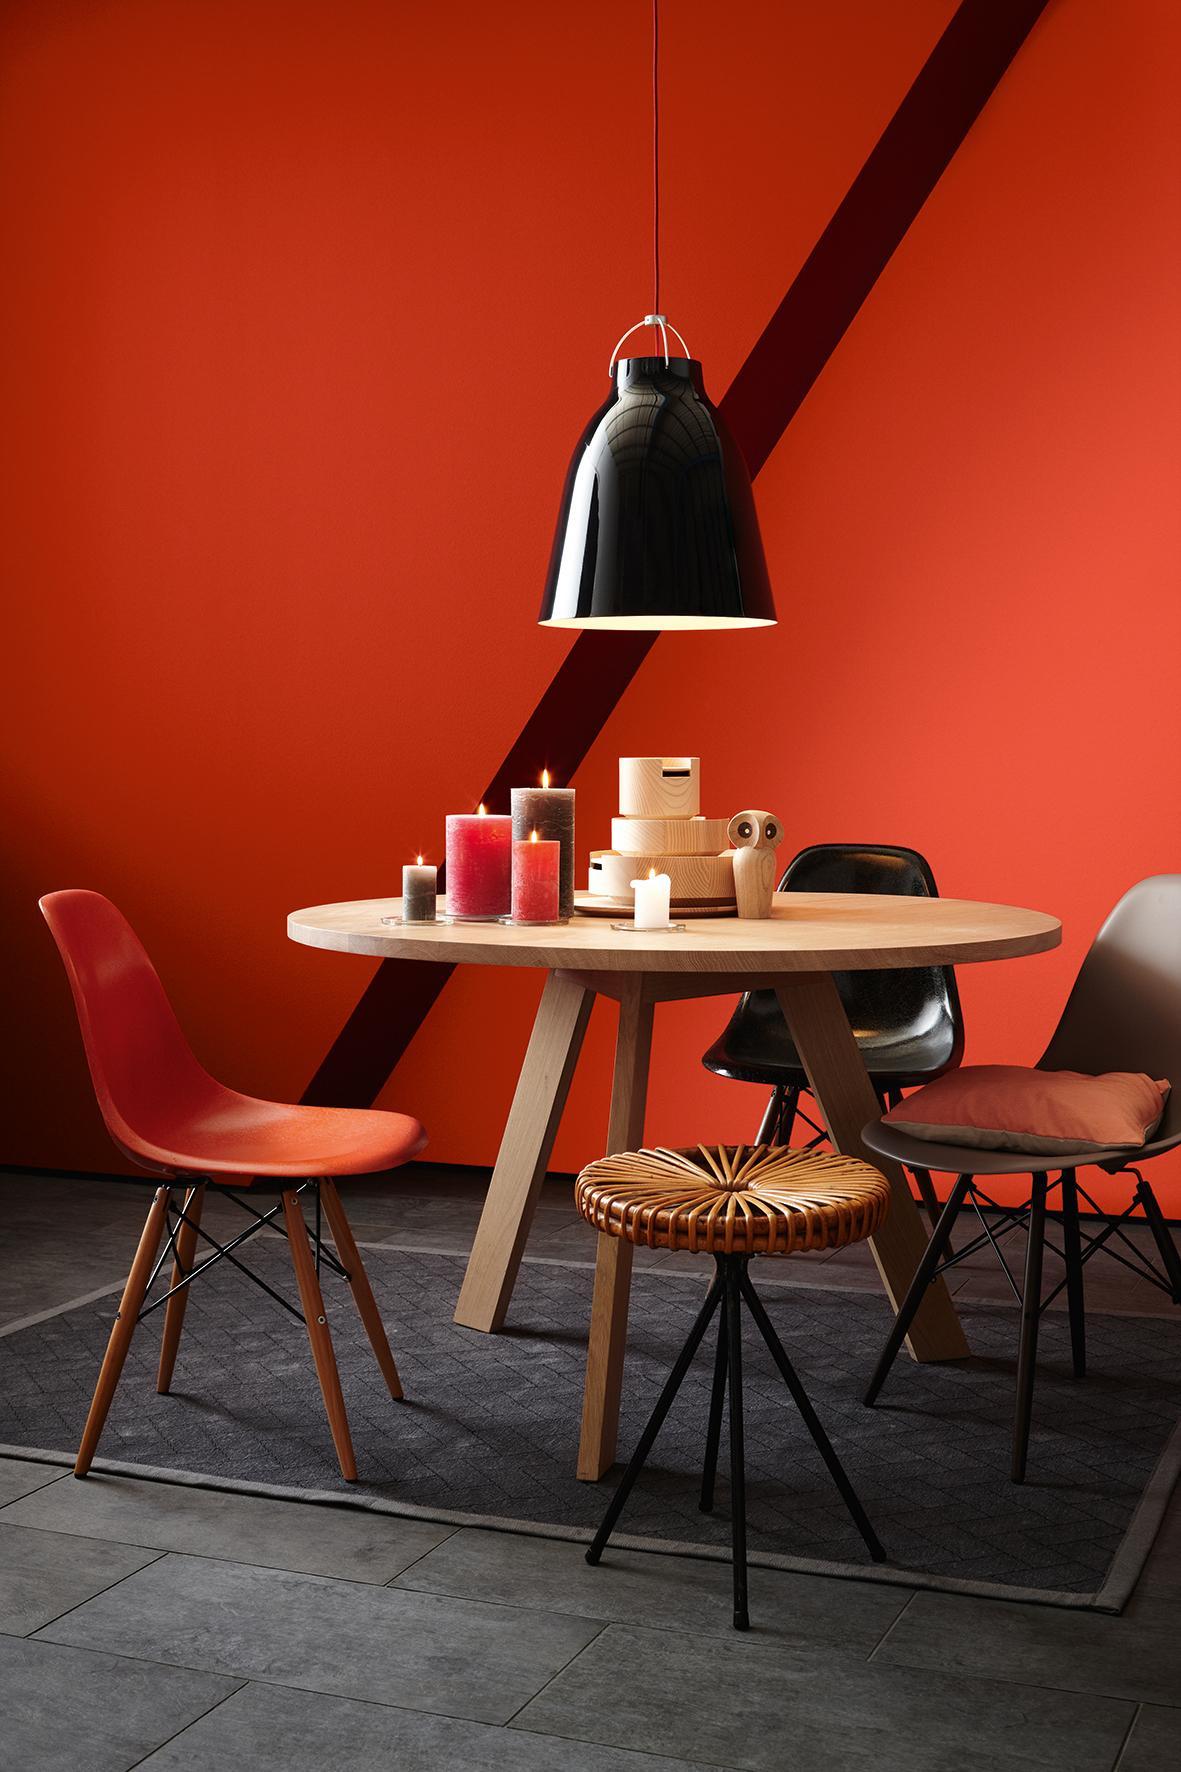 Rote wandfarbe bilder ideen couchstyle - Rote wandfarbe ...